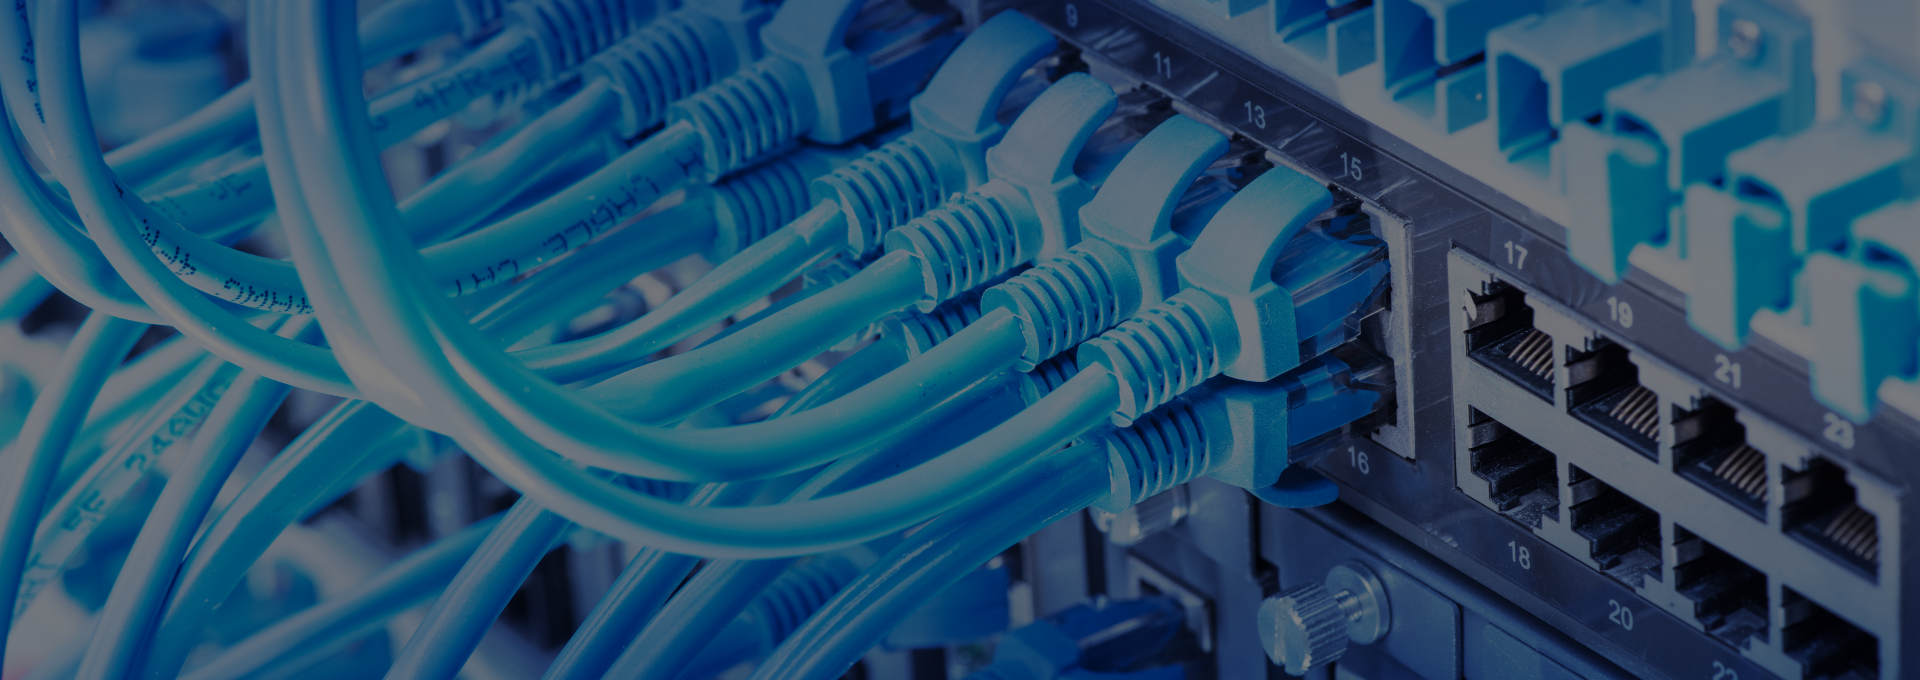 American Telecom Company Builds a Data Hub to Take on Load of 2.8 PB